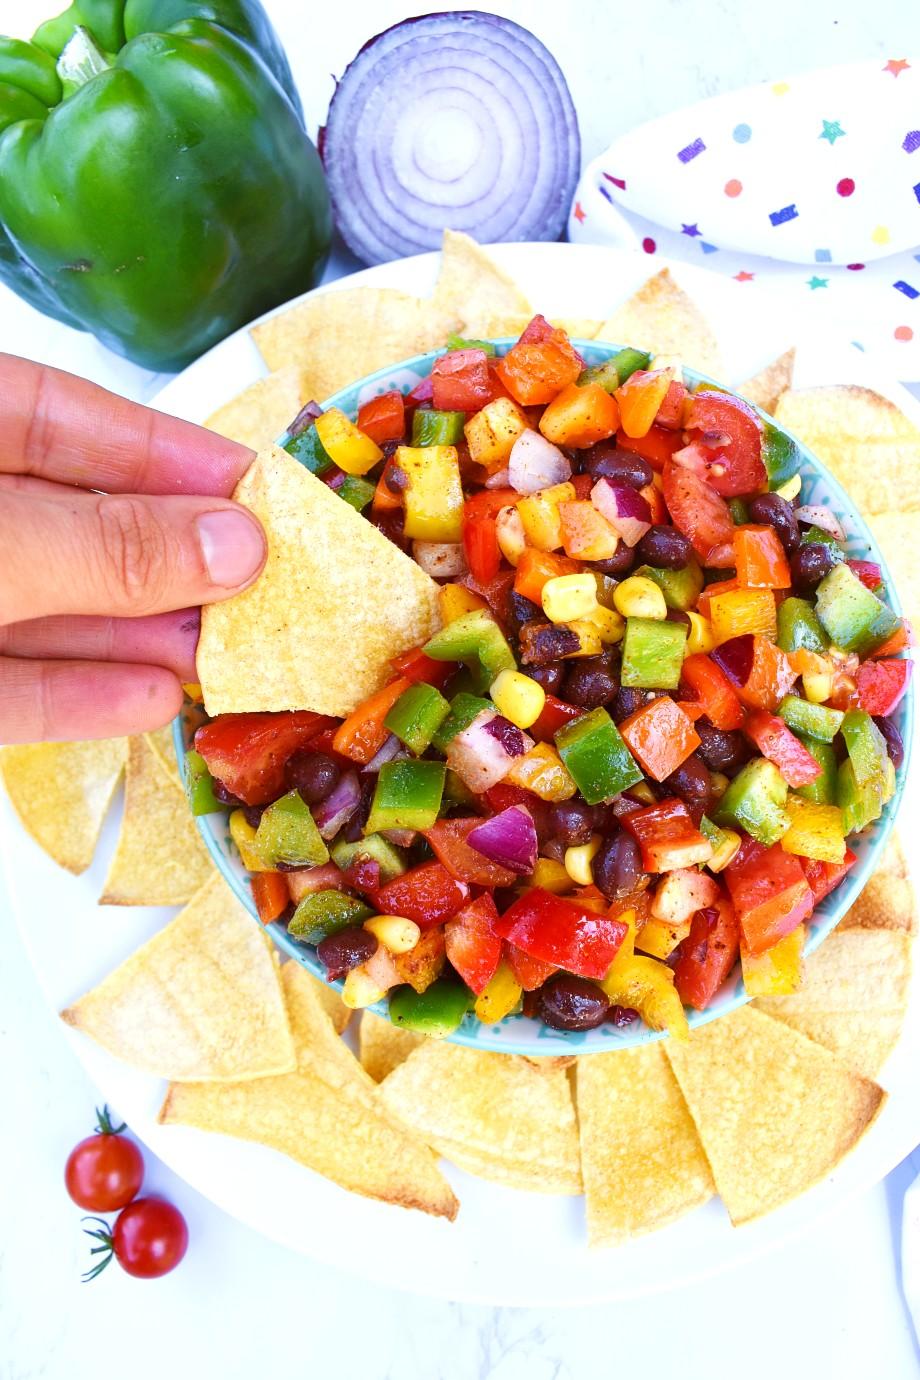 Chip with texas caviar